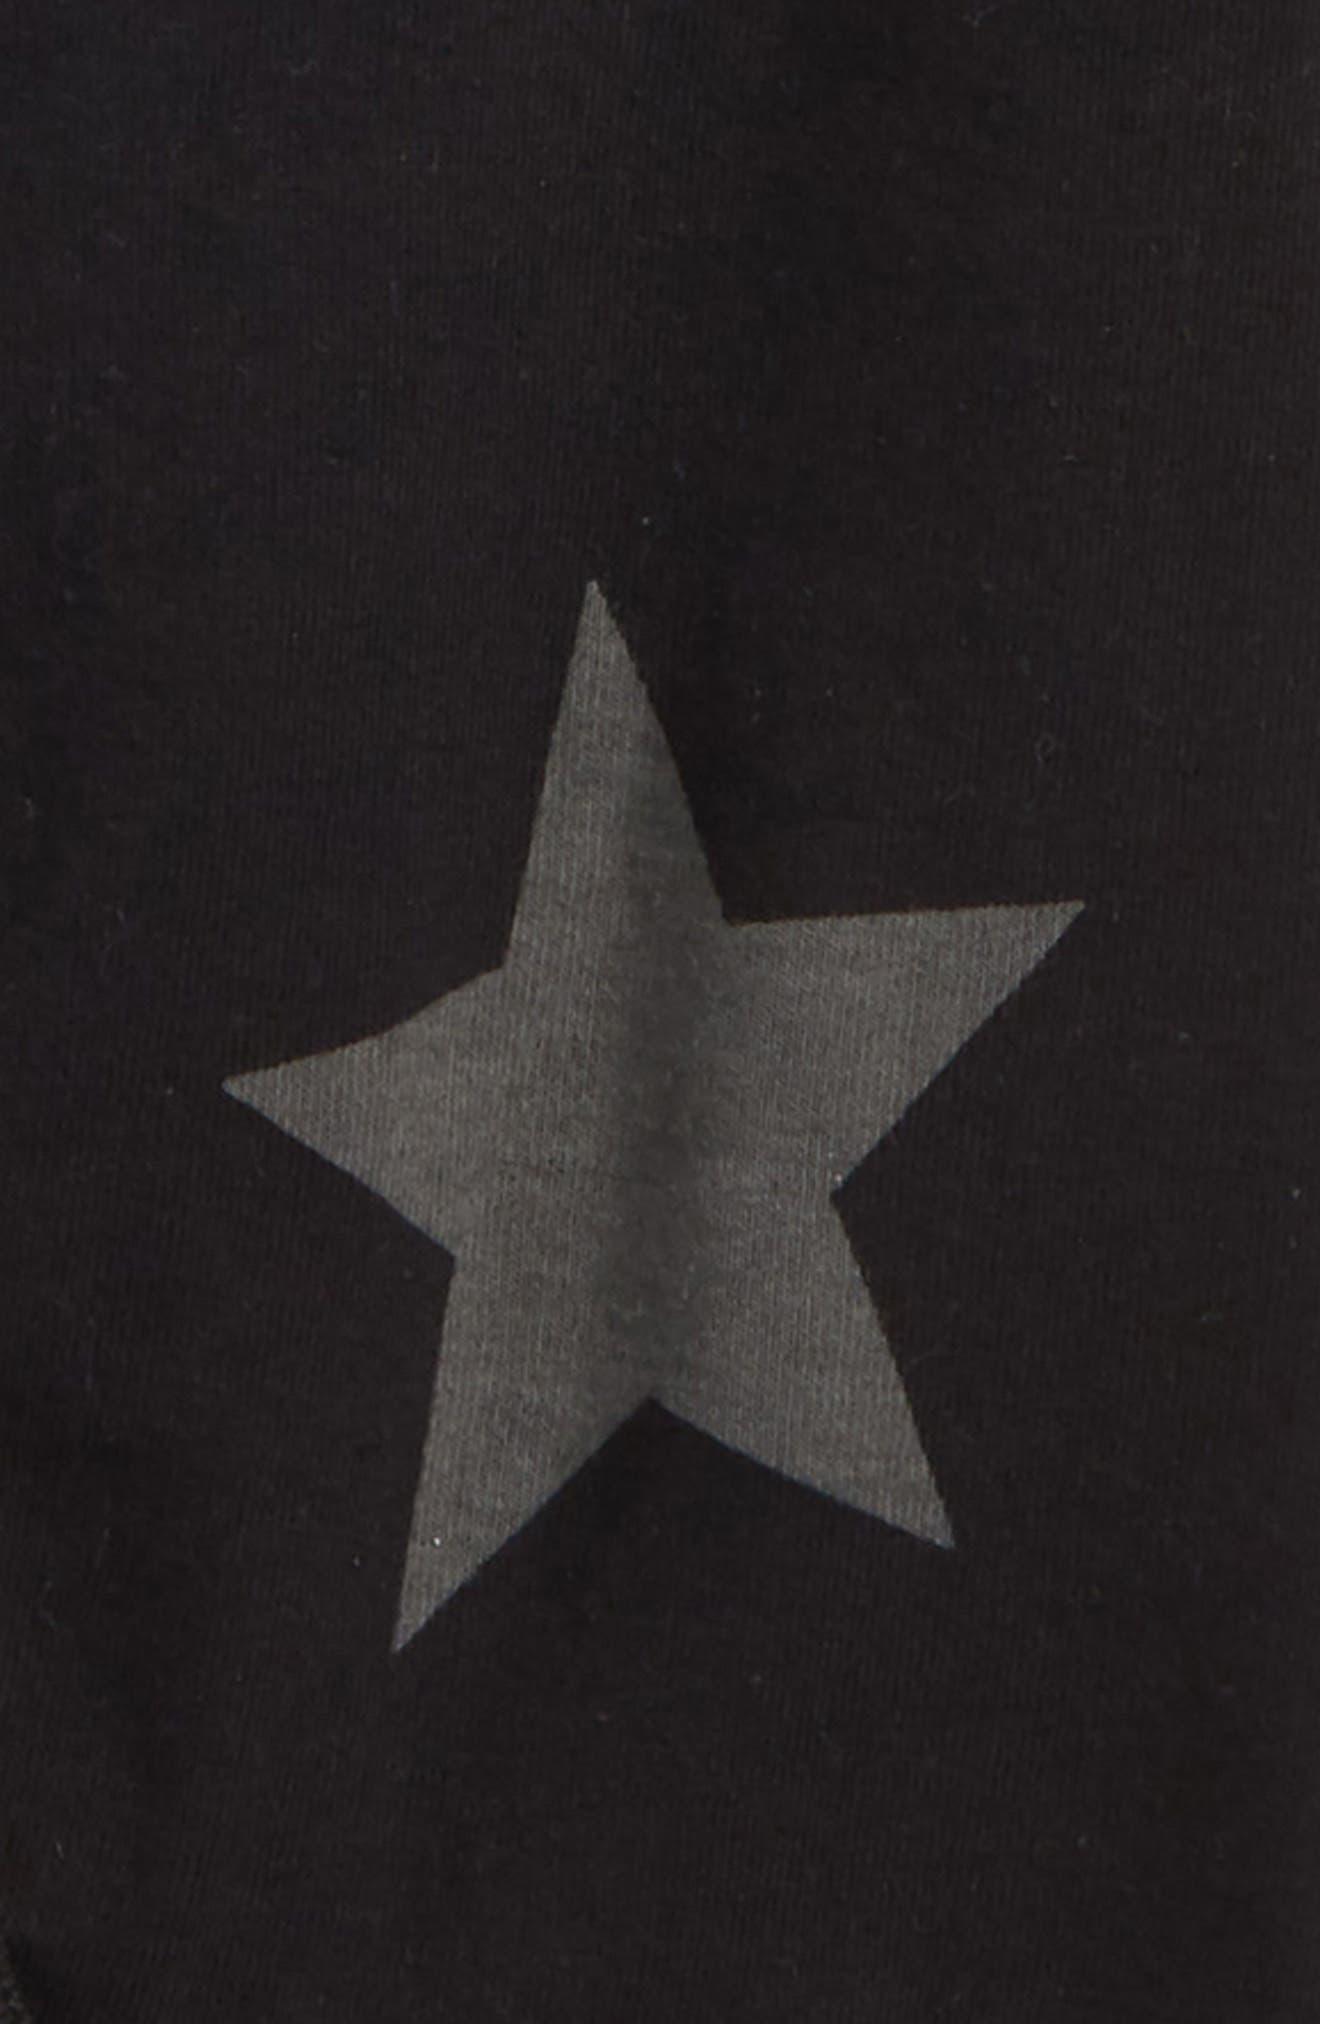 Star Print Footie,                             Alternate thumbnail 2, color,                             Black